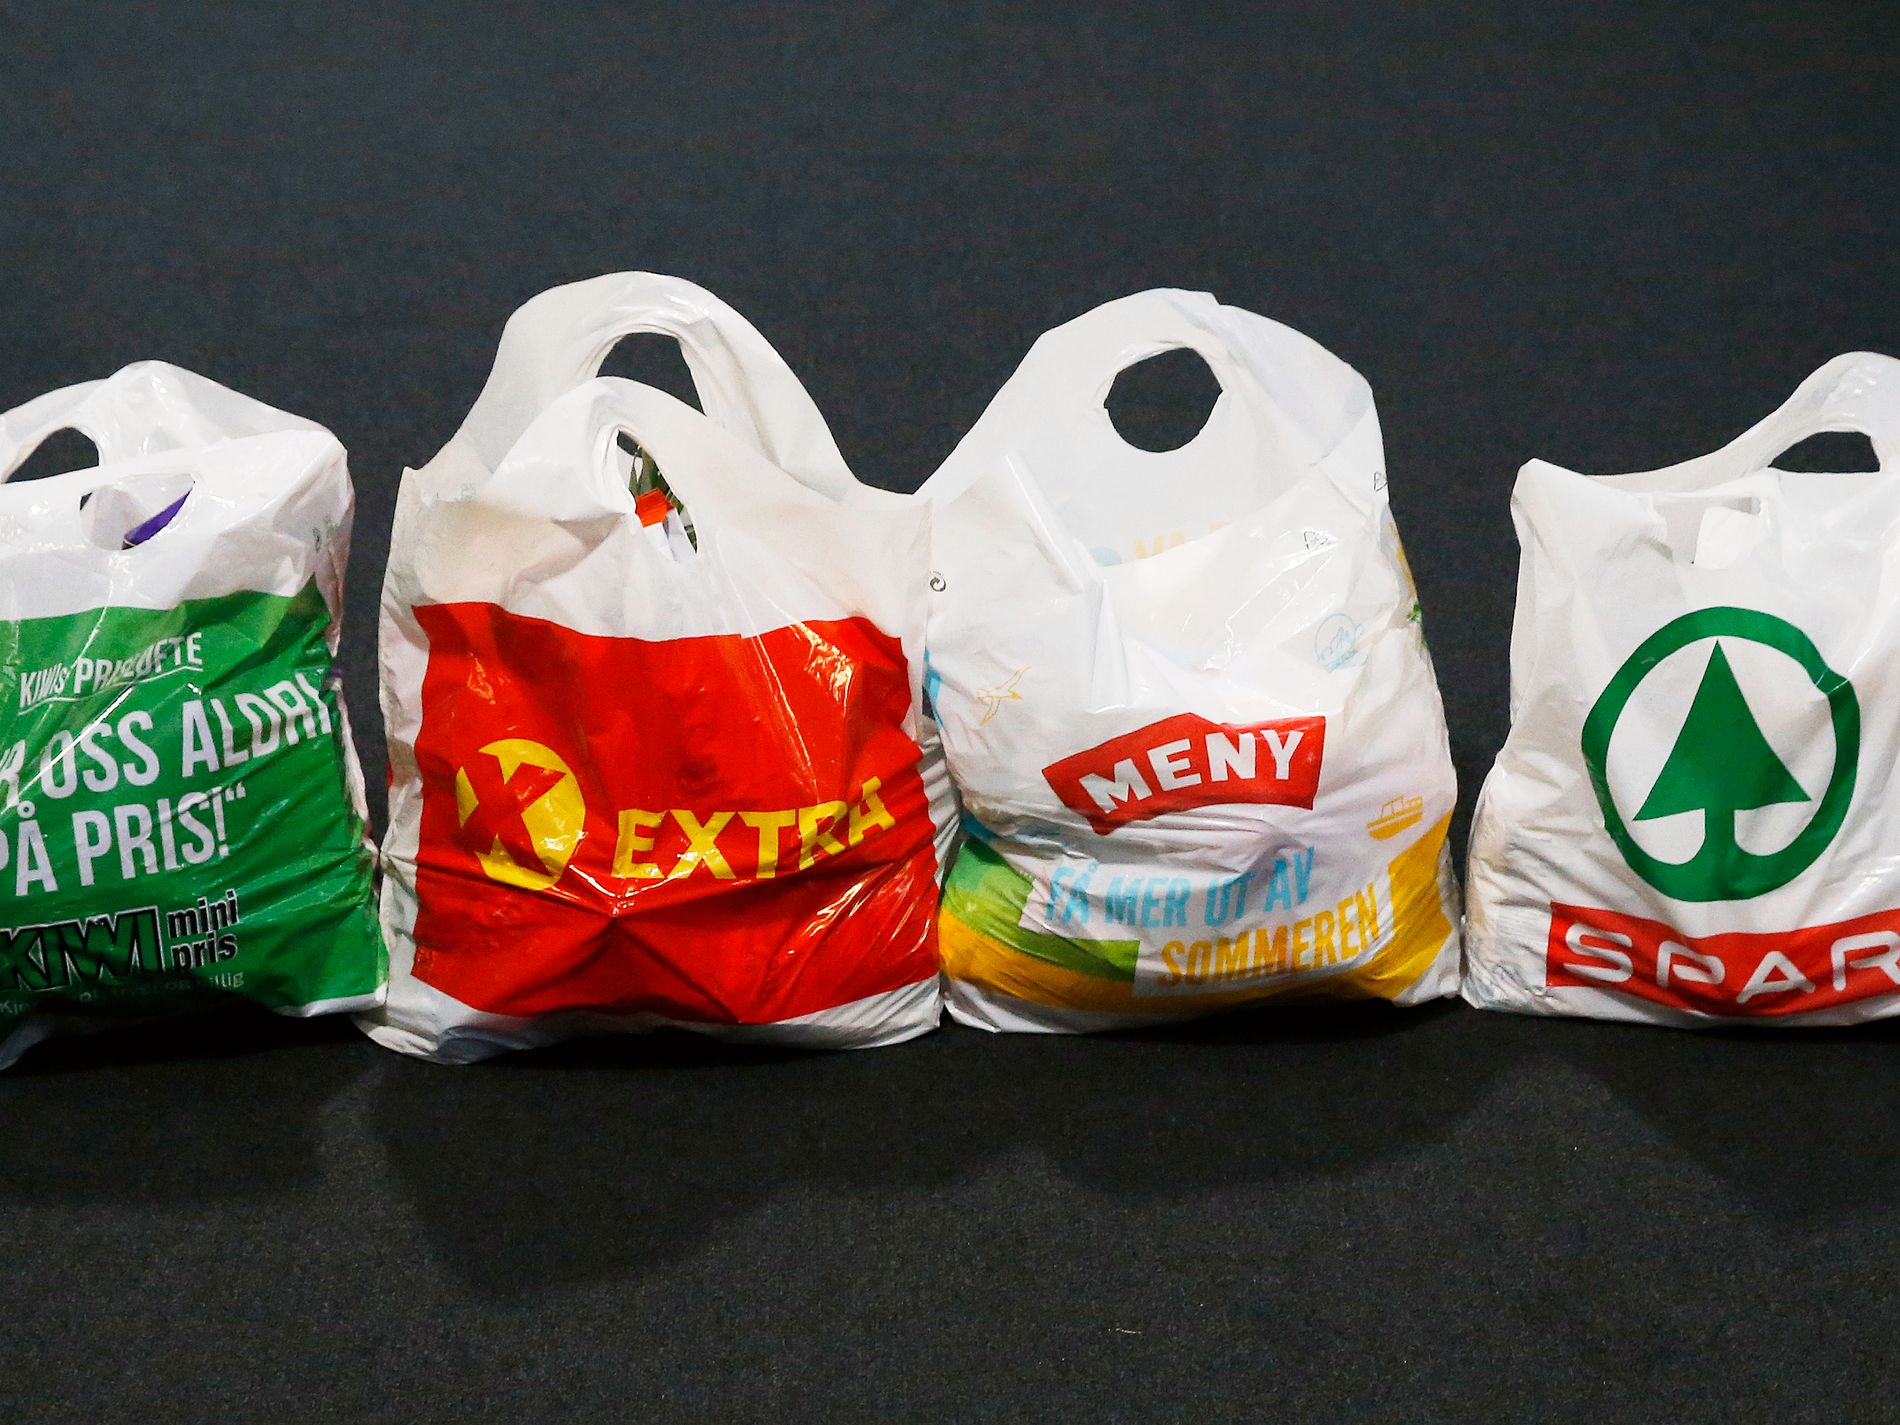 VGs store matbørs: Rema billigst igjen – VG